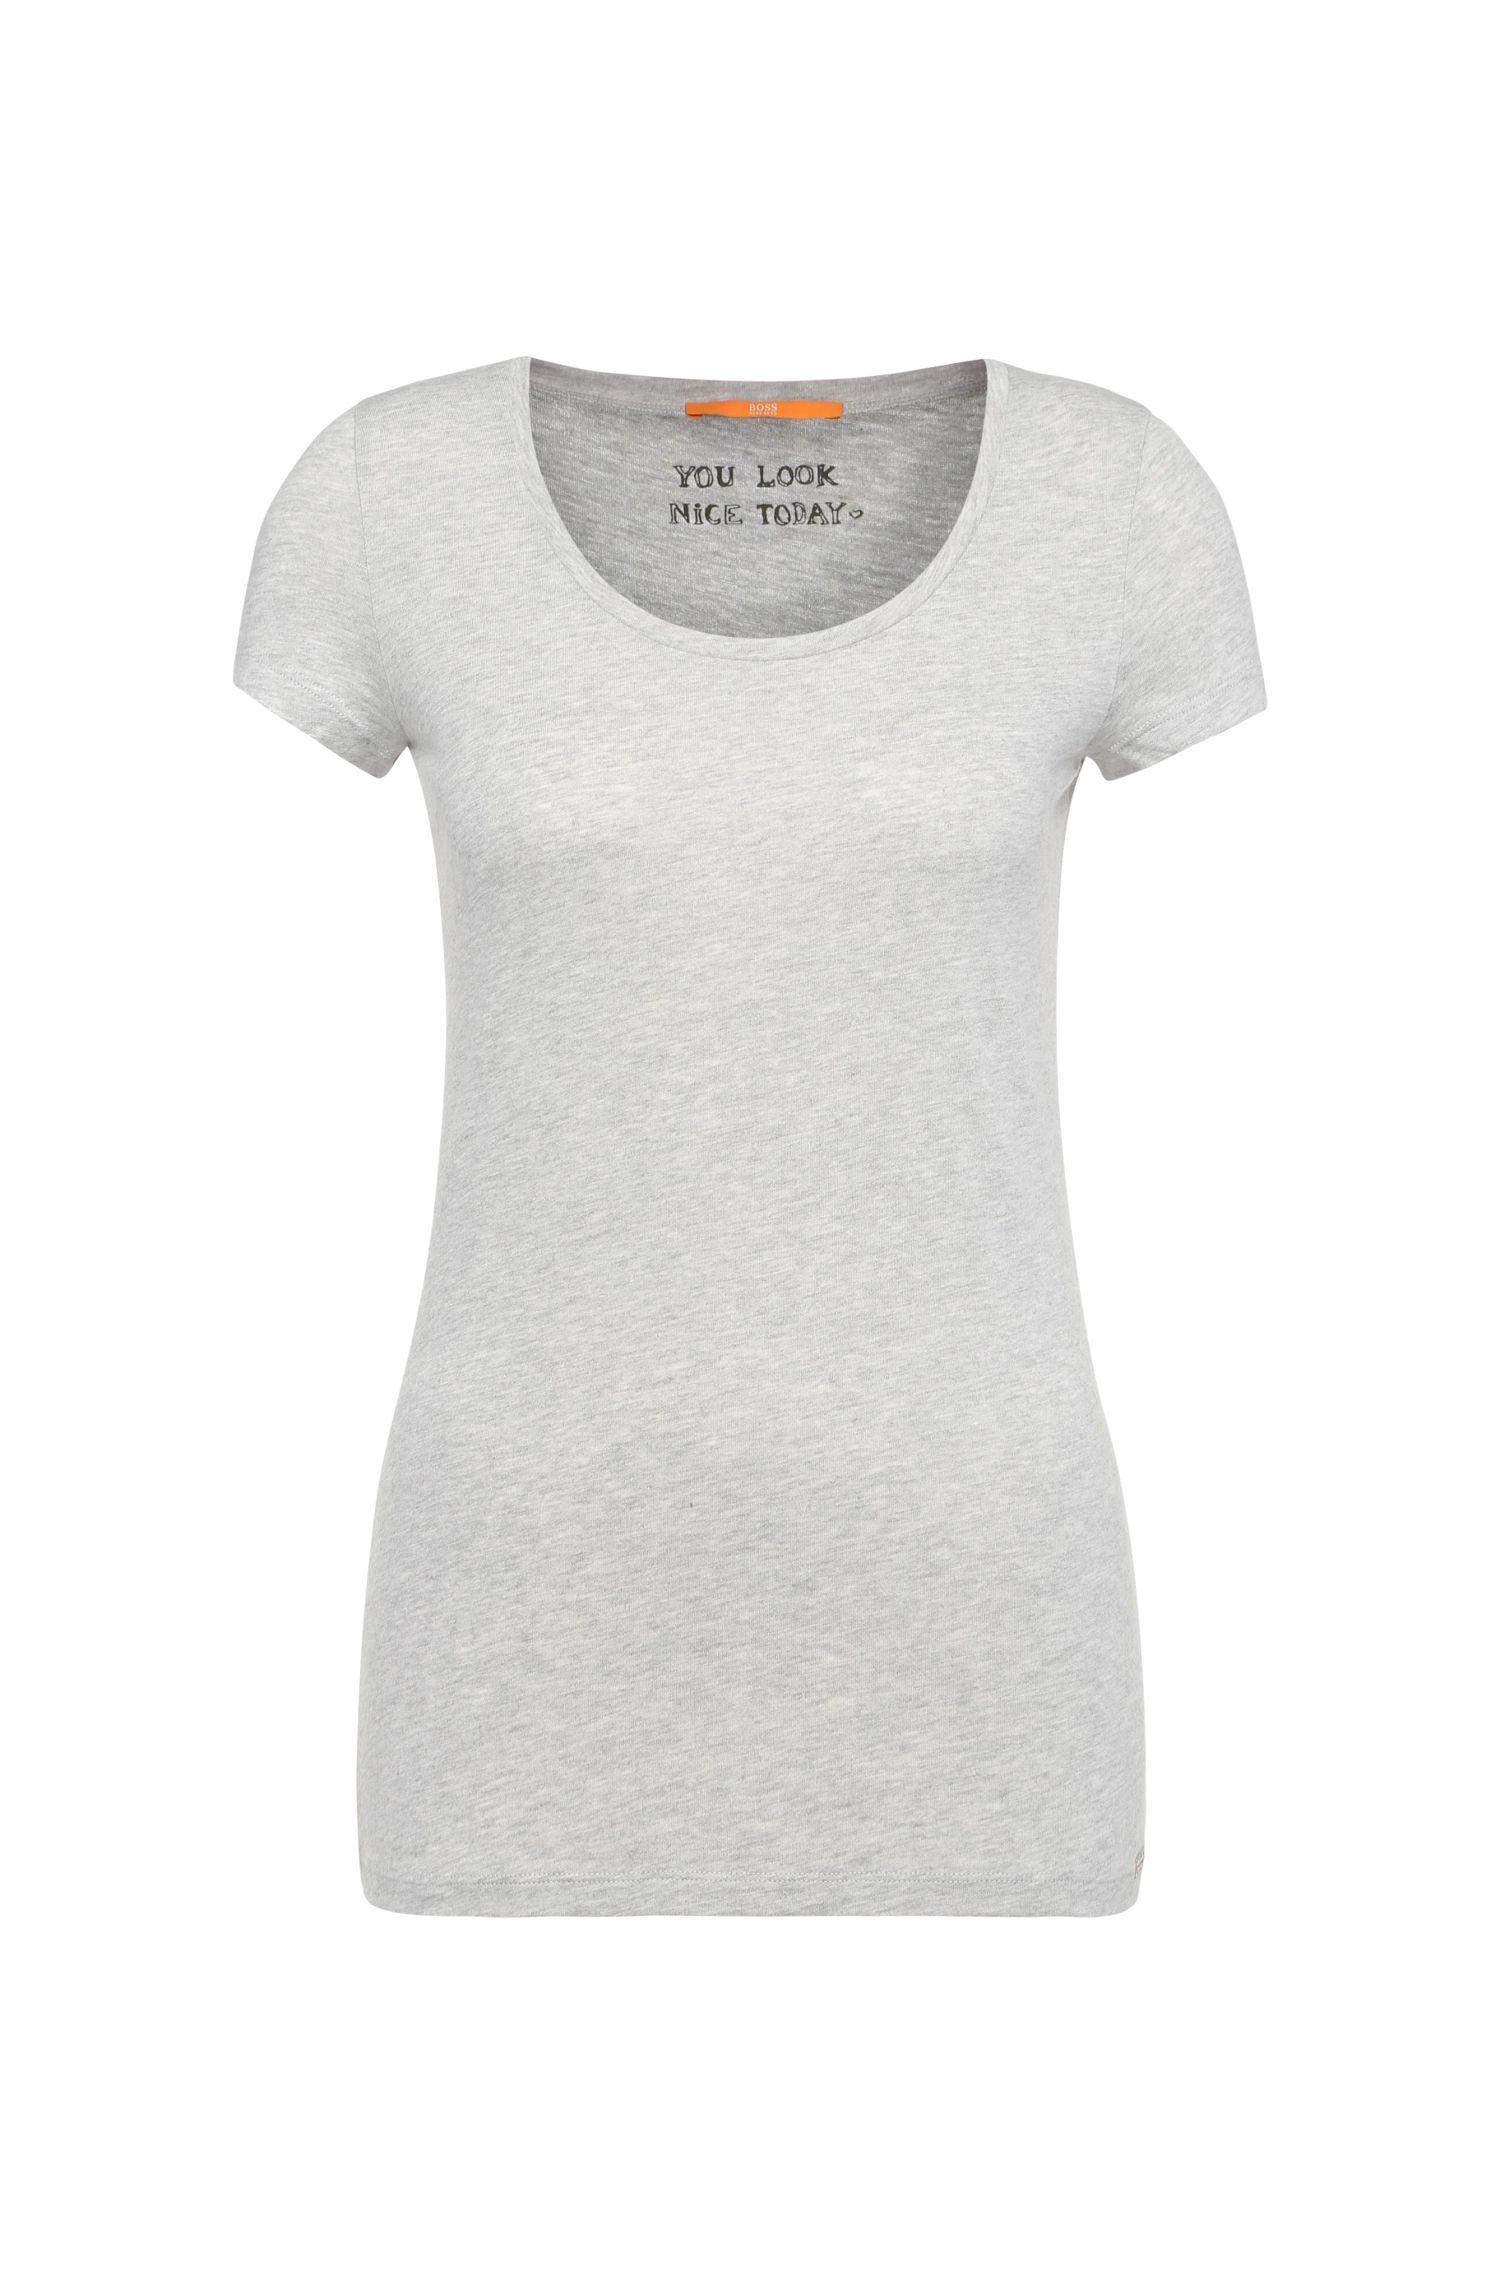 Slim-Fit T-Shirt aus angerautem Baumwoll-Mix mit Modal